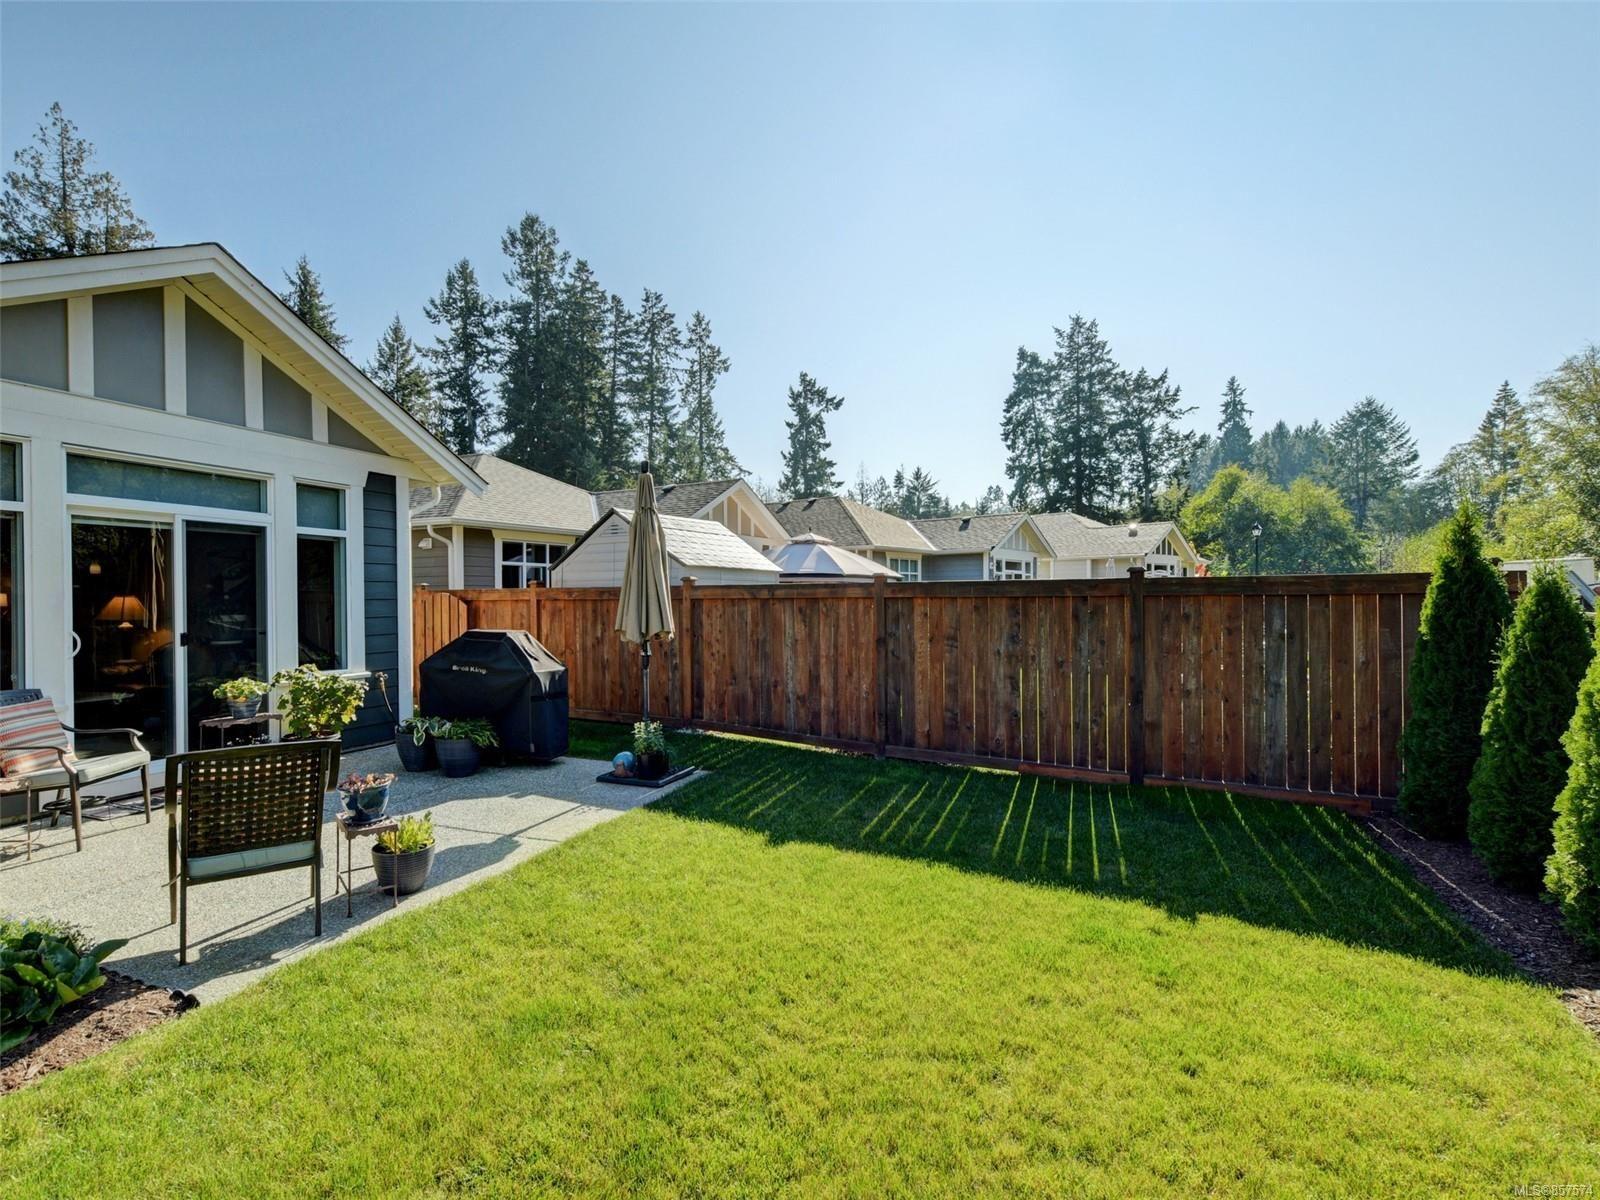 Photo 20: Photos: 6376 Shambrook Dr in : Sk Sunriver House for sale (Sooke)  : MLS®# 857574